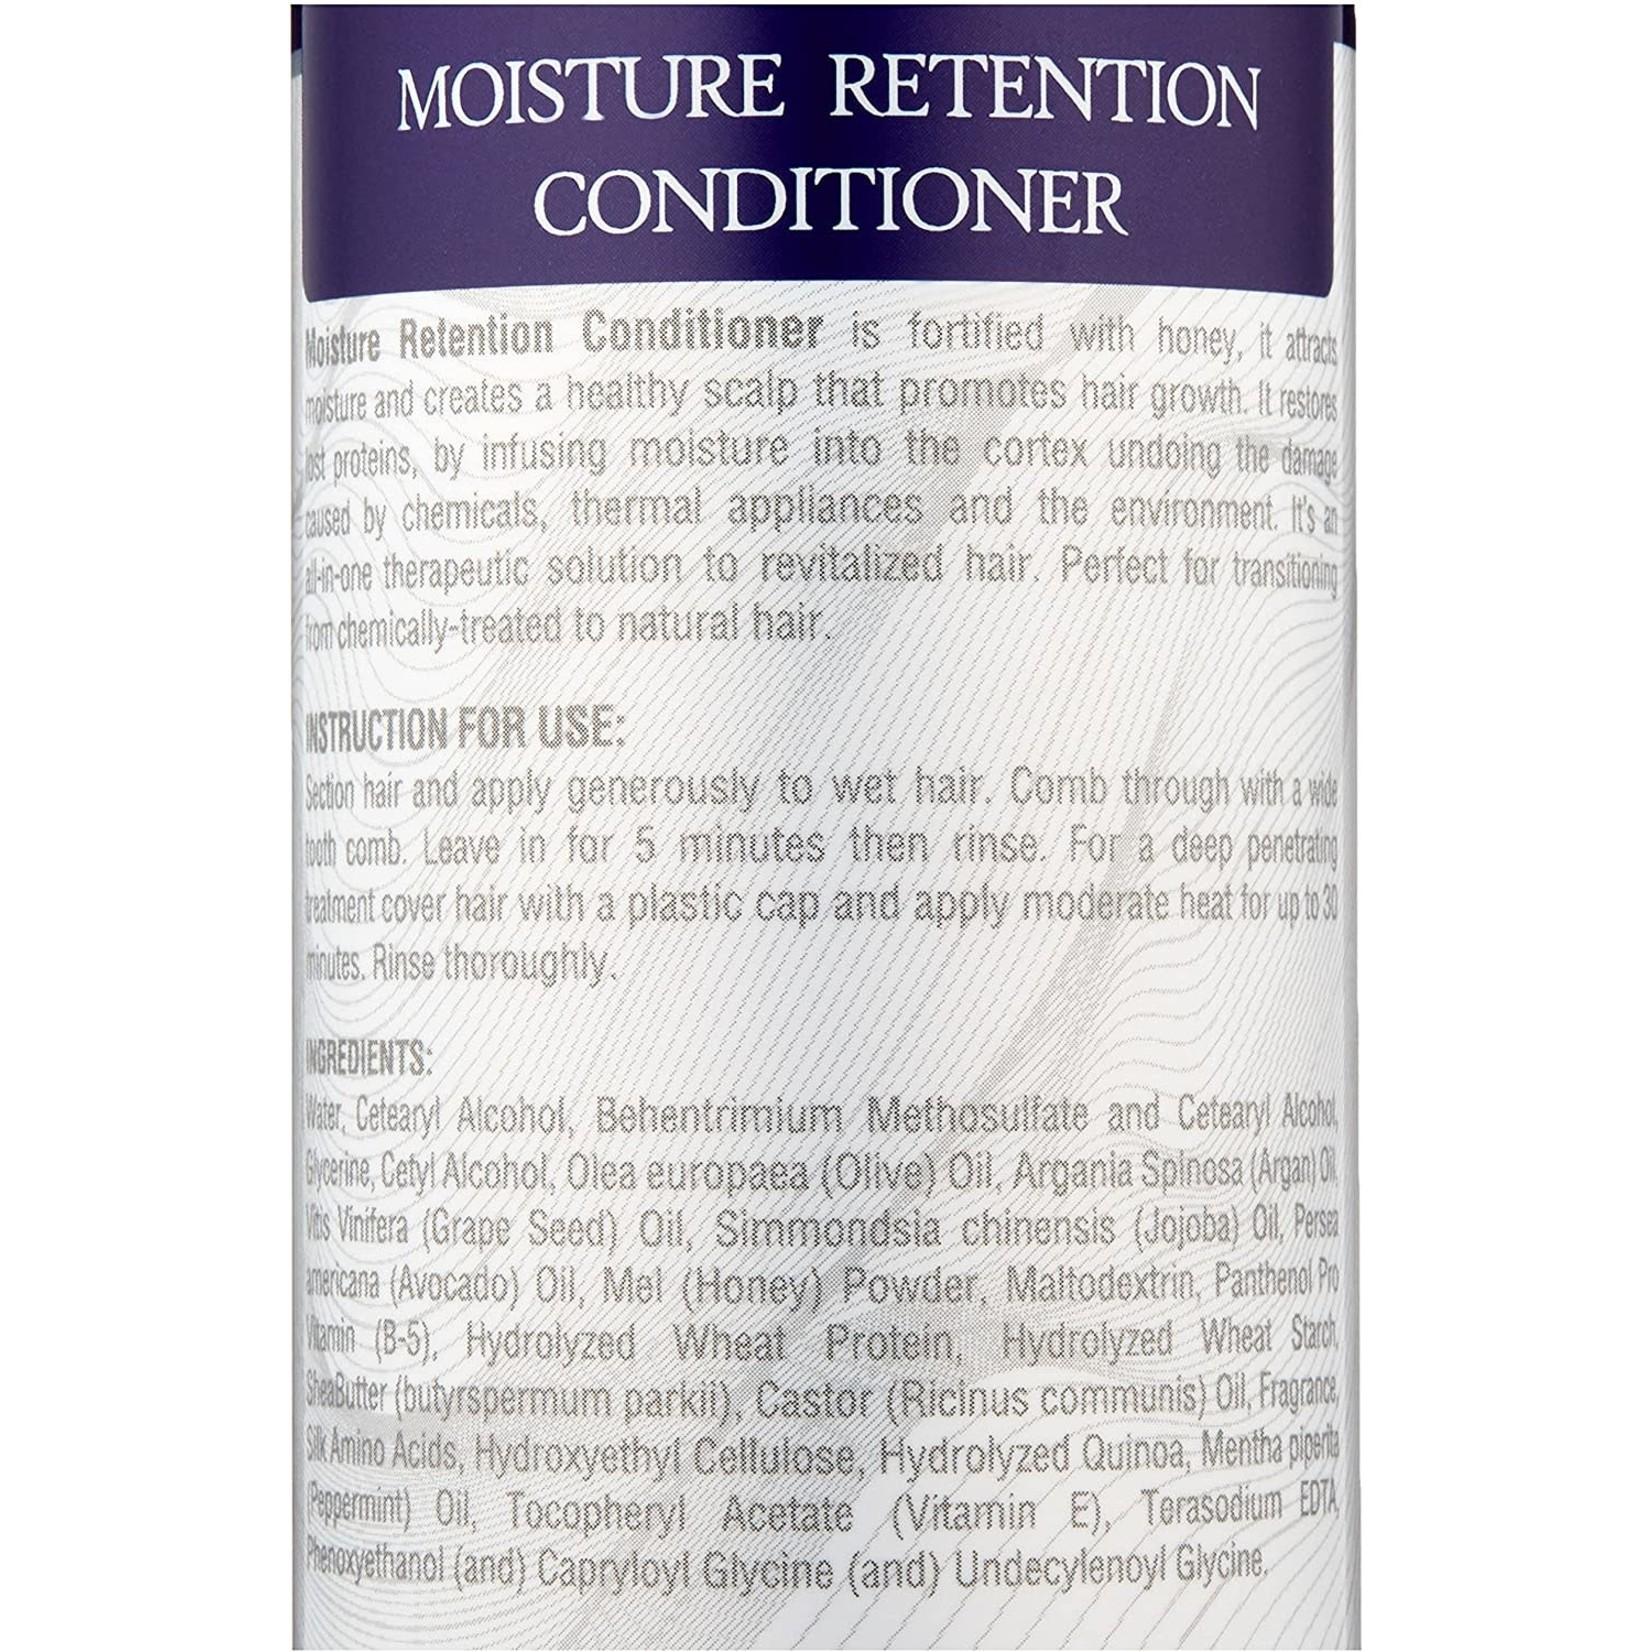 Moisture Retention Conditioner